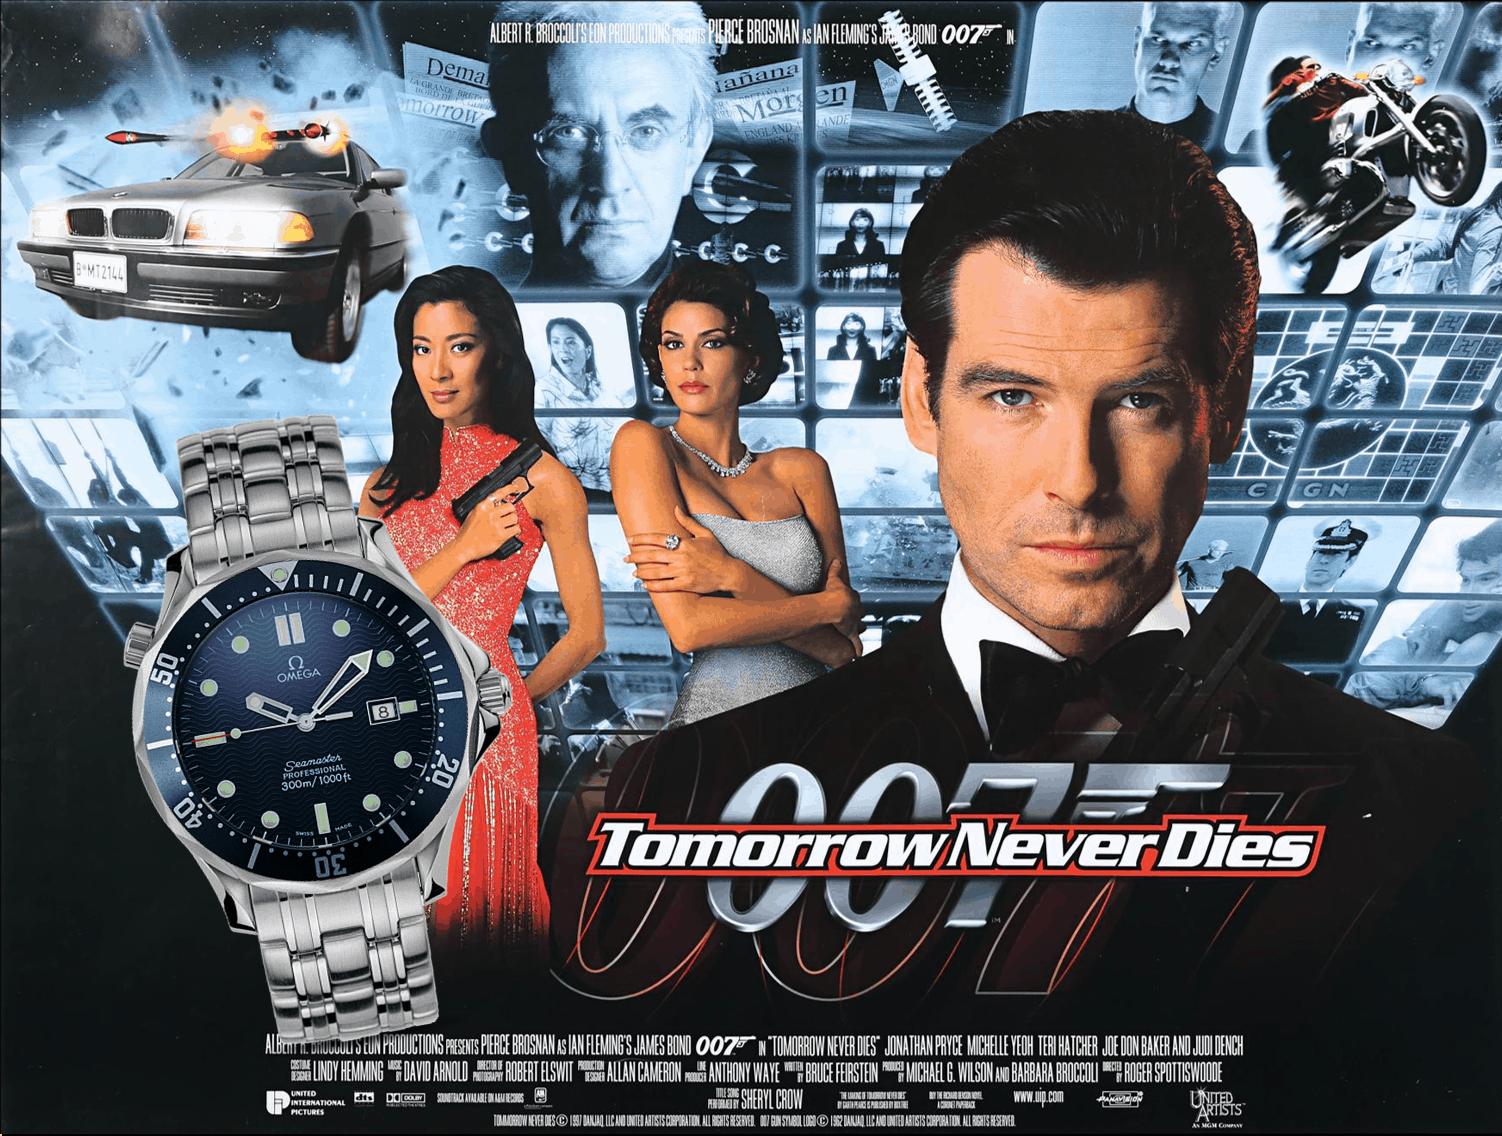 James Bond Uhr Der Morgen stirbt nie 1997 Omega Seamaster Professional